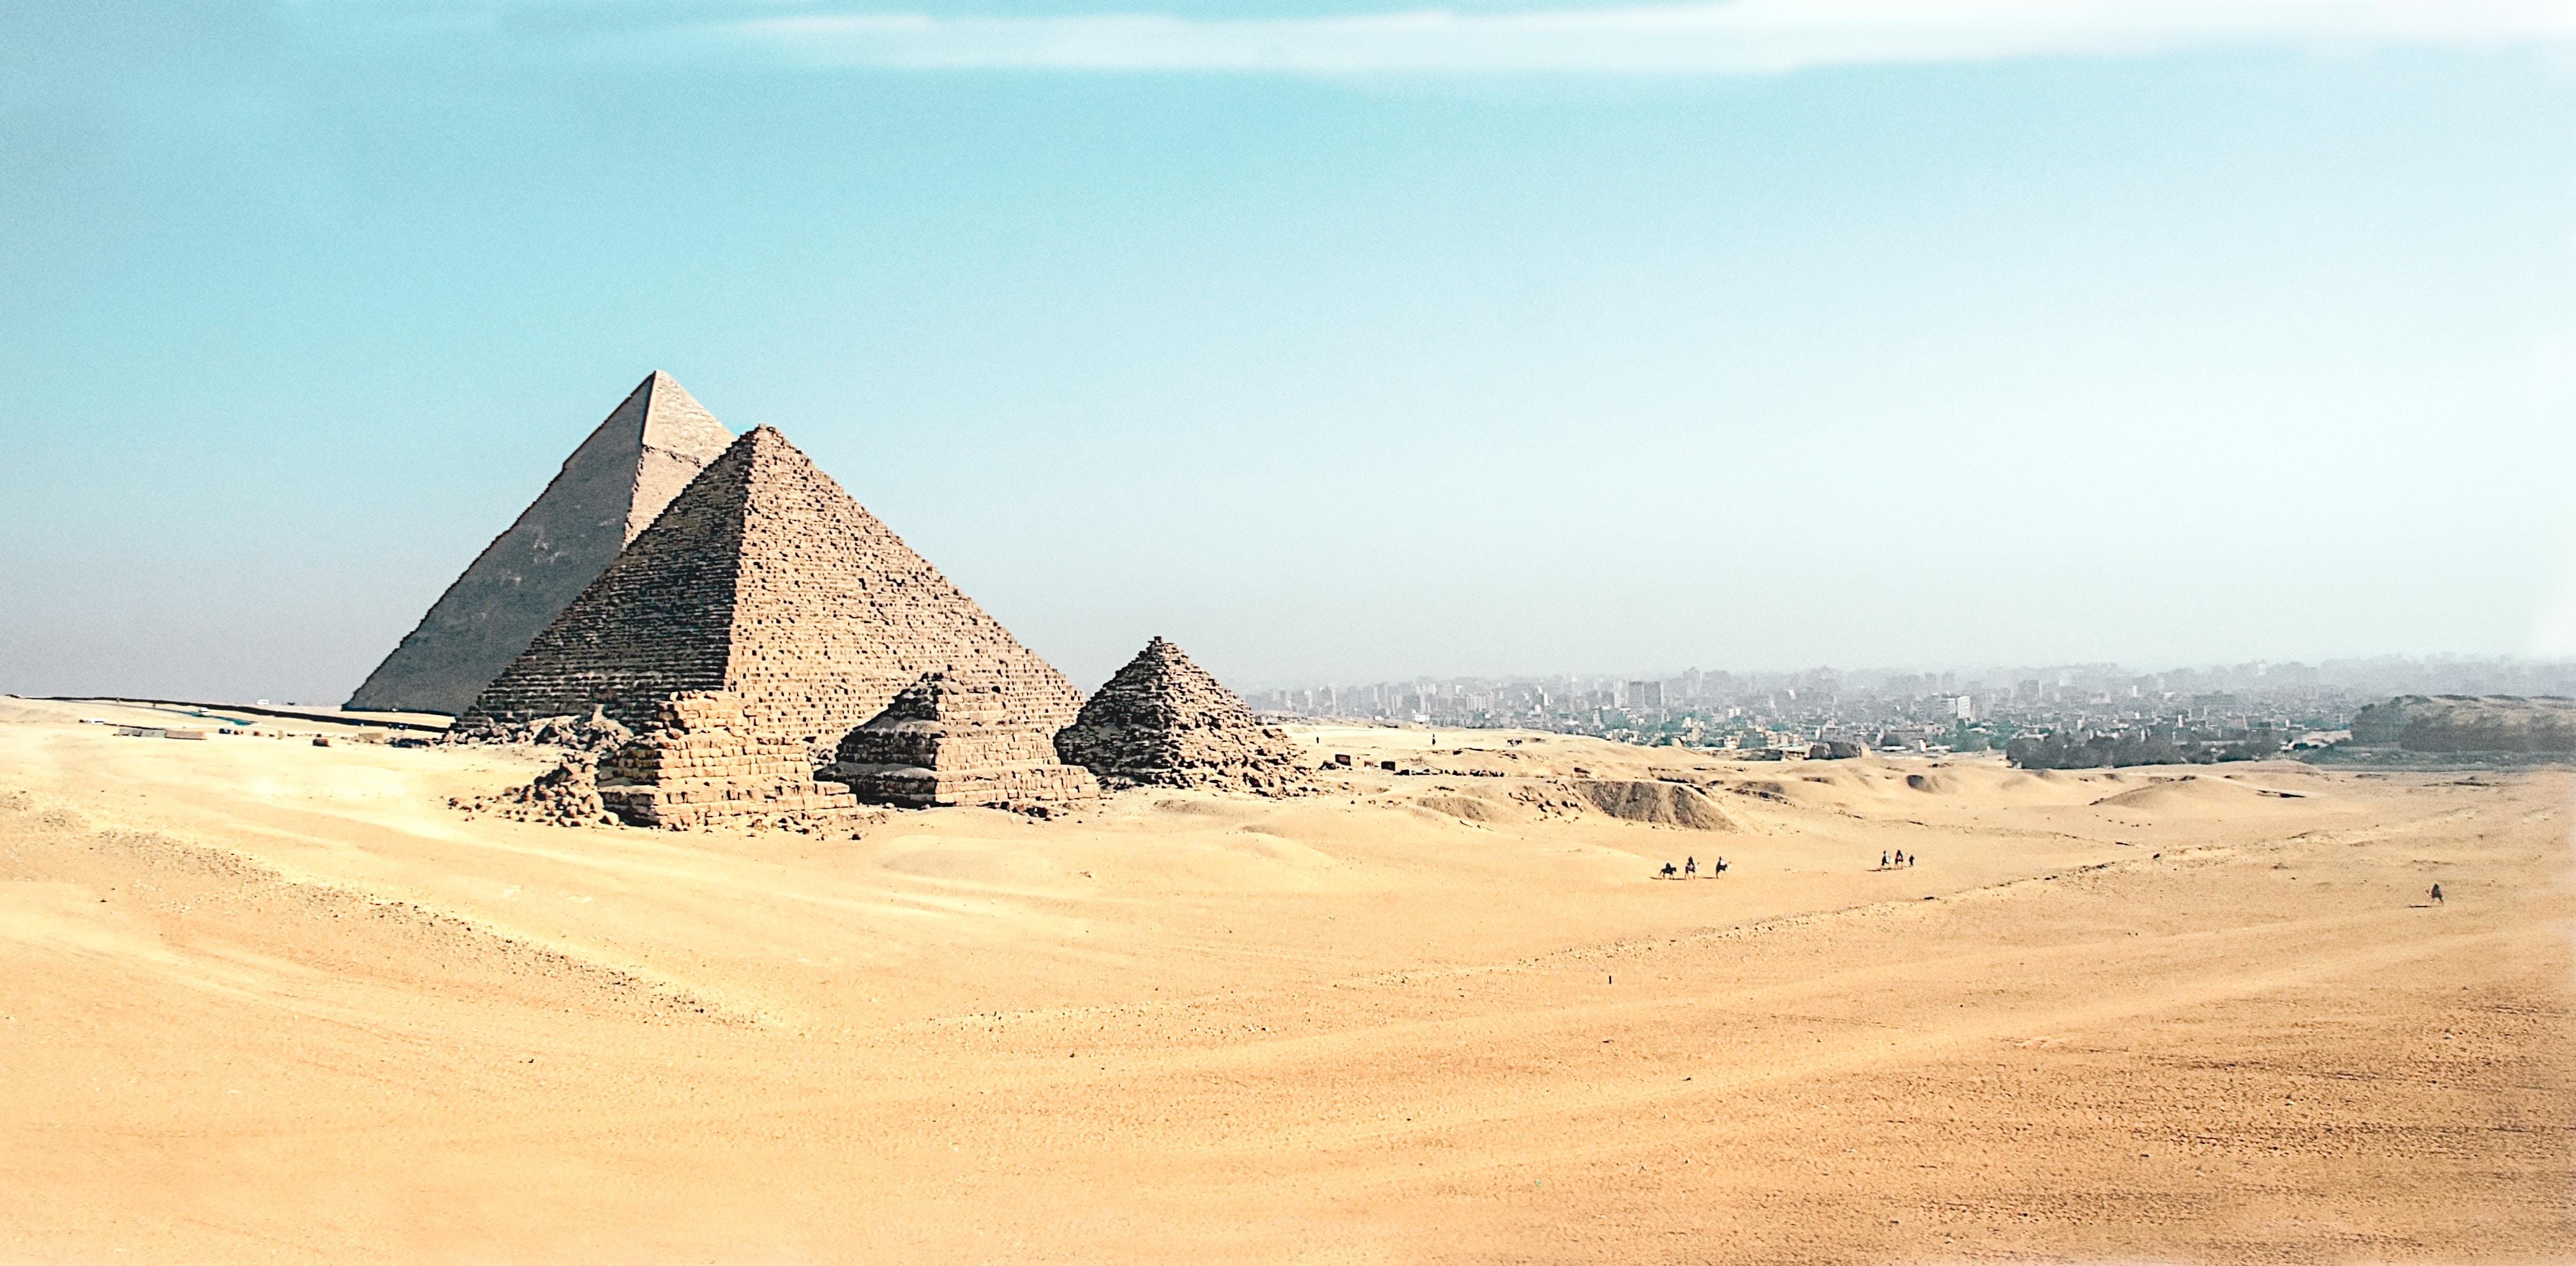 Pyramid of Giza during daytime